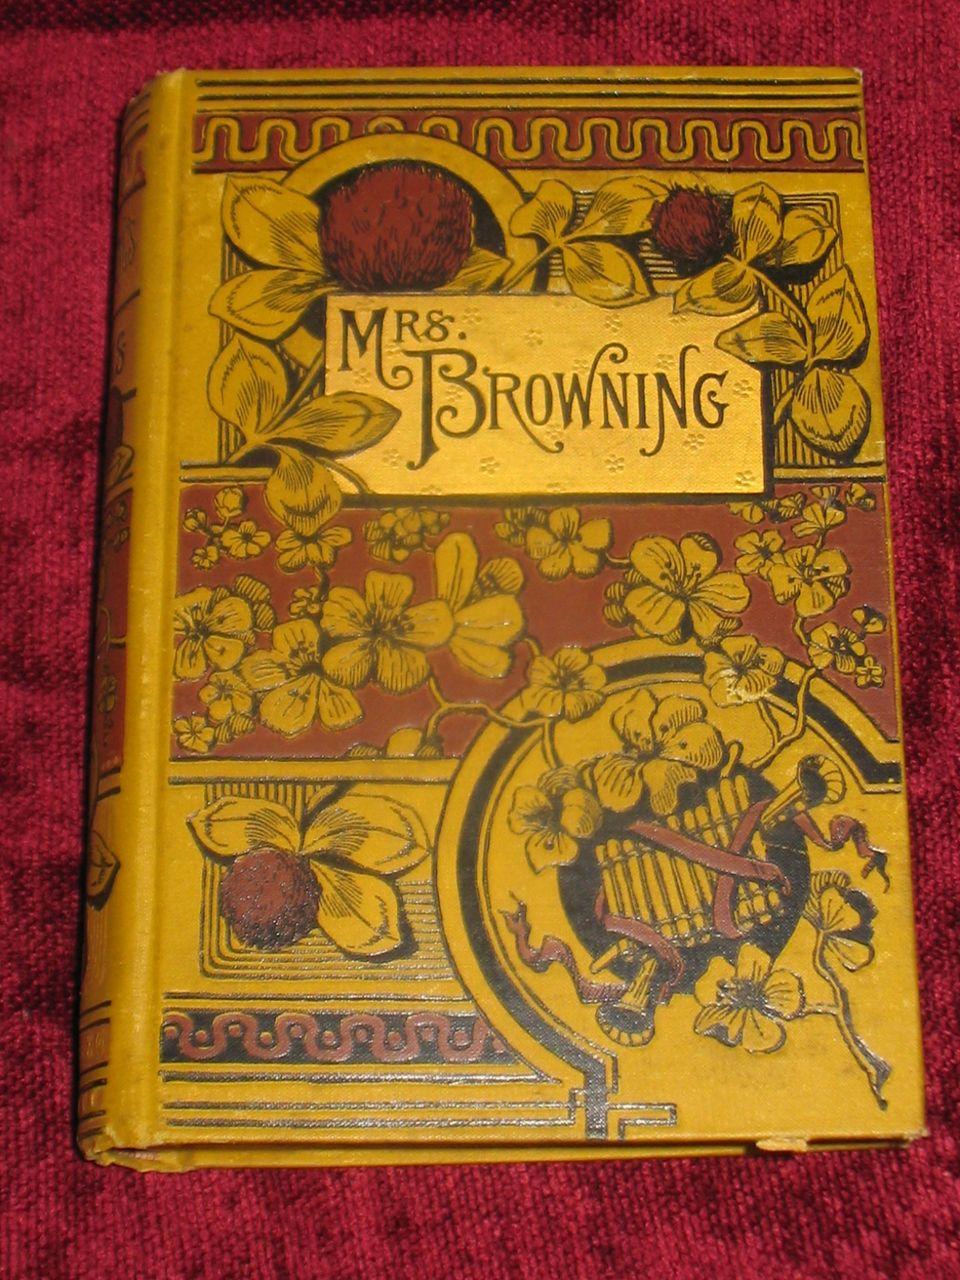 Mrs. Browning book by Elizabeth Barrett Browning